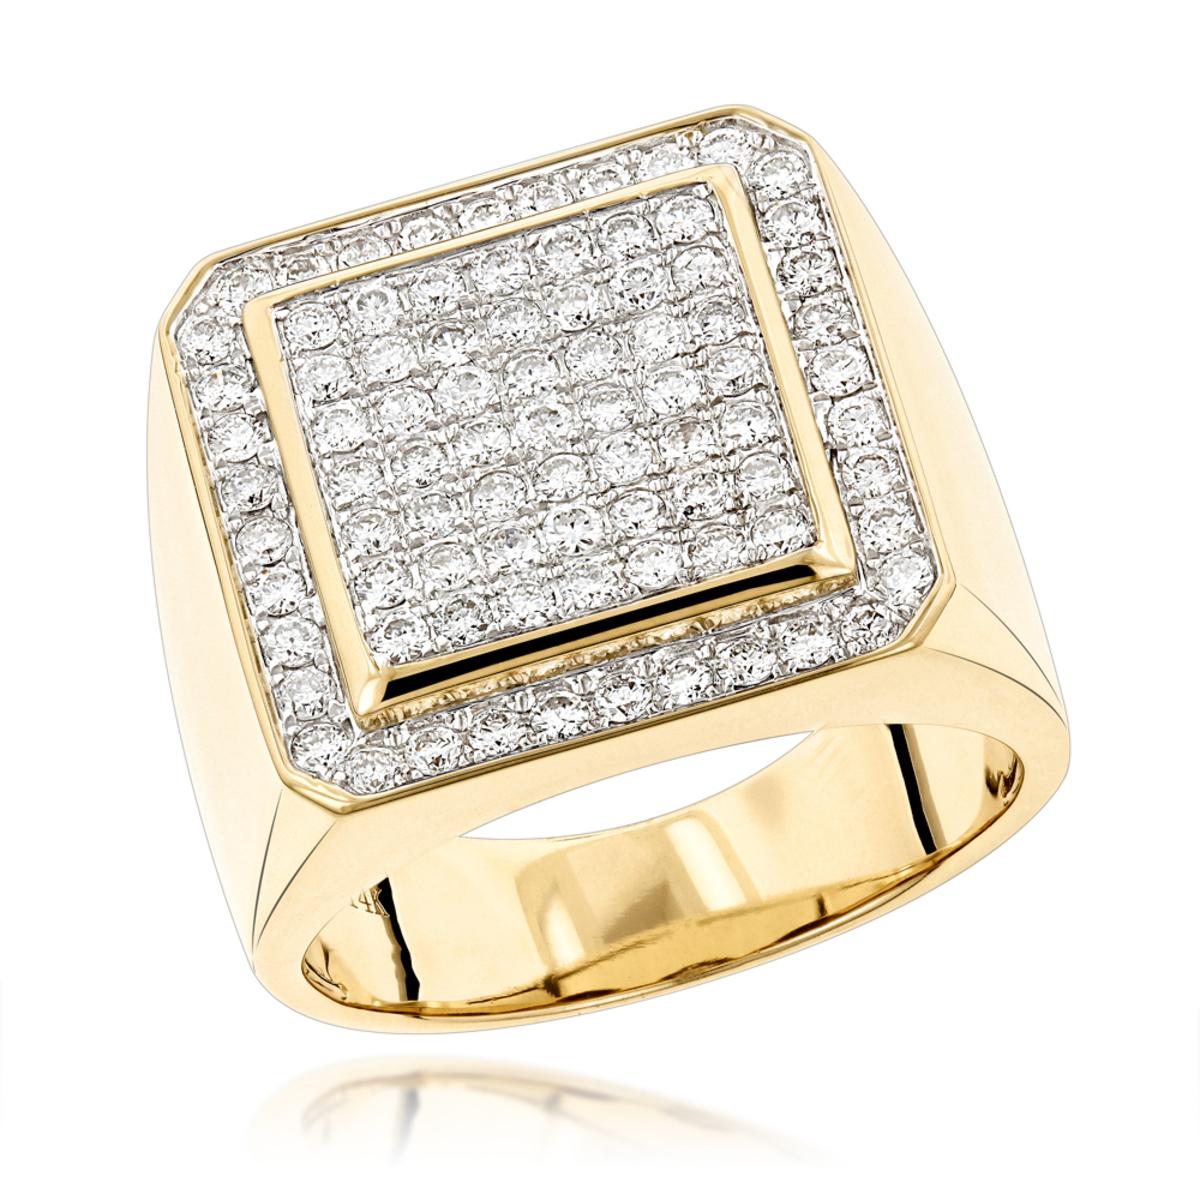 Designer Pinky Rings Mens Diamond Gold Ring by Luxurman 1.63ct 14K ...